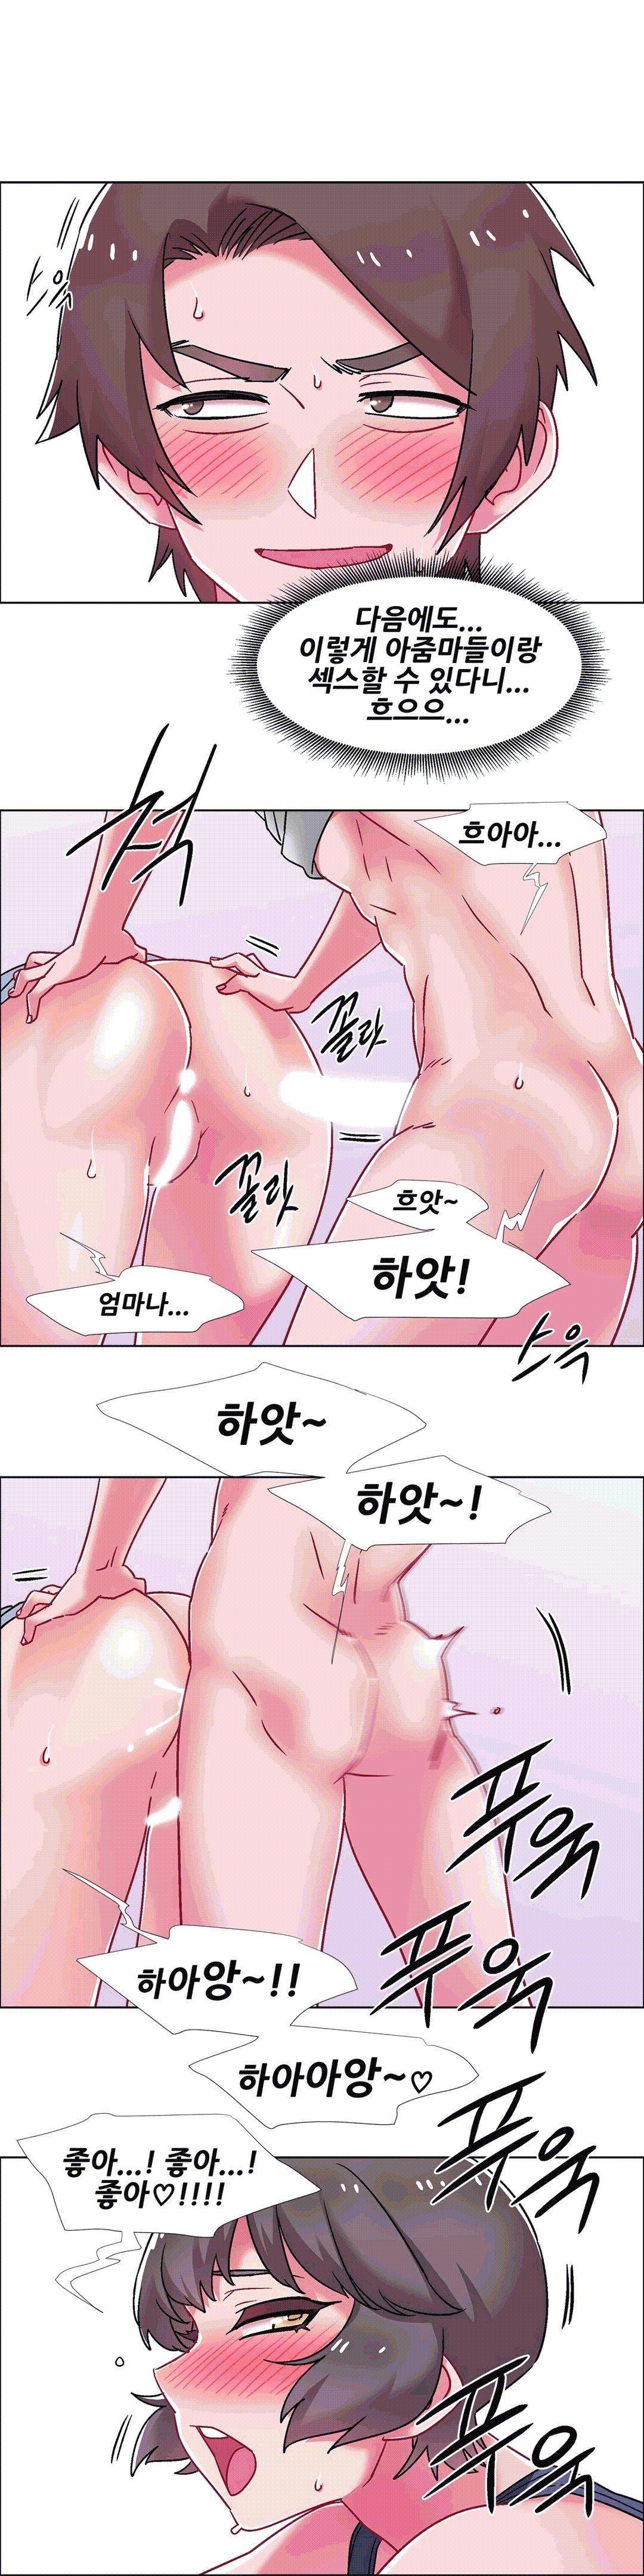 [Studio Wannabe] Rental Girls | 出租女郎 Ch. 33-58 [Chinese]  第二季 完结 629